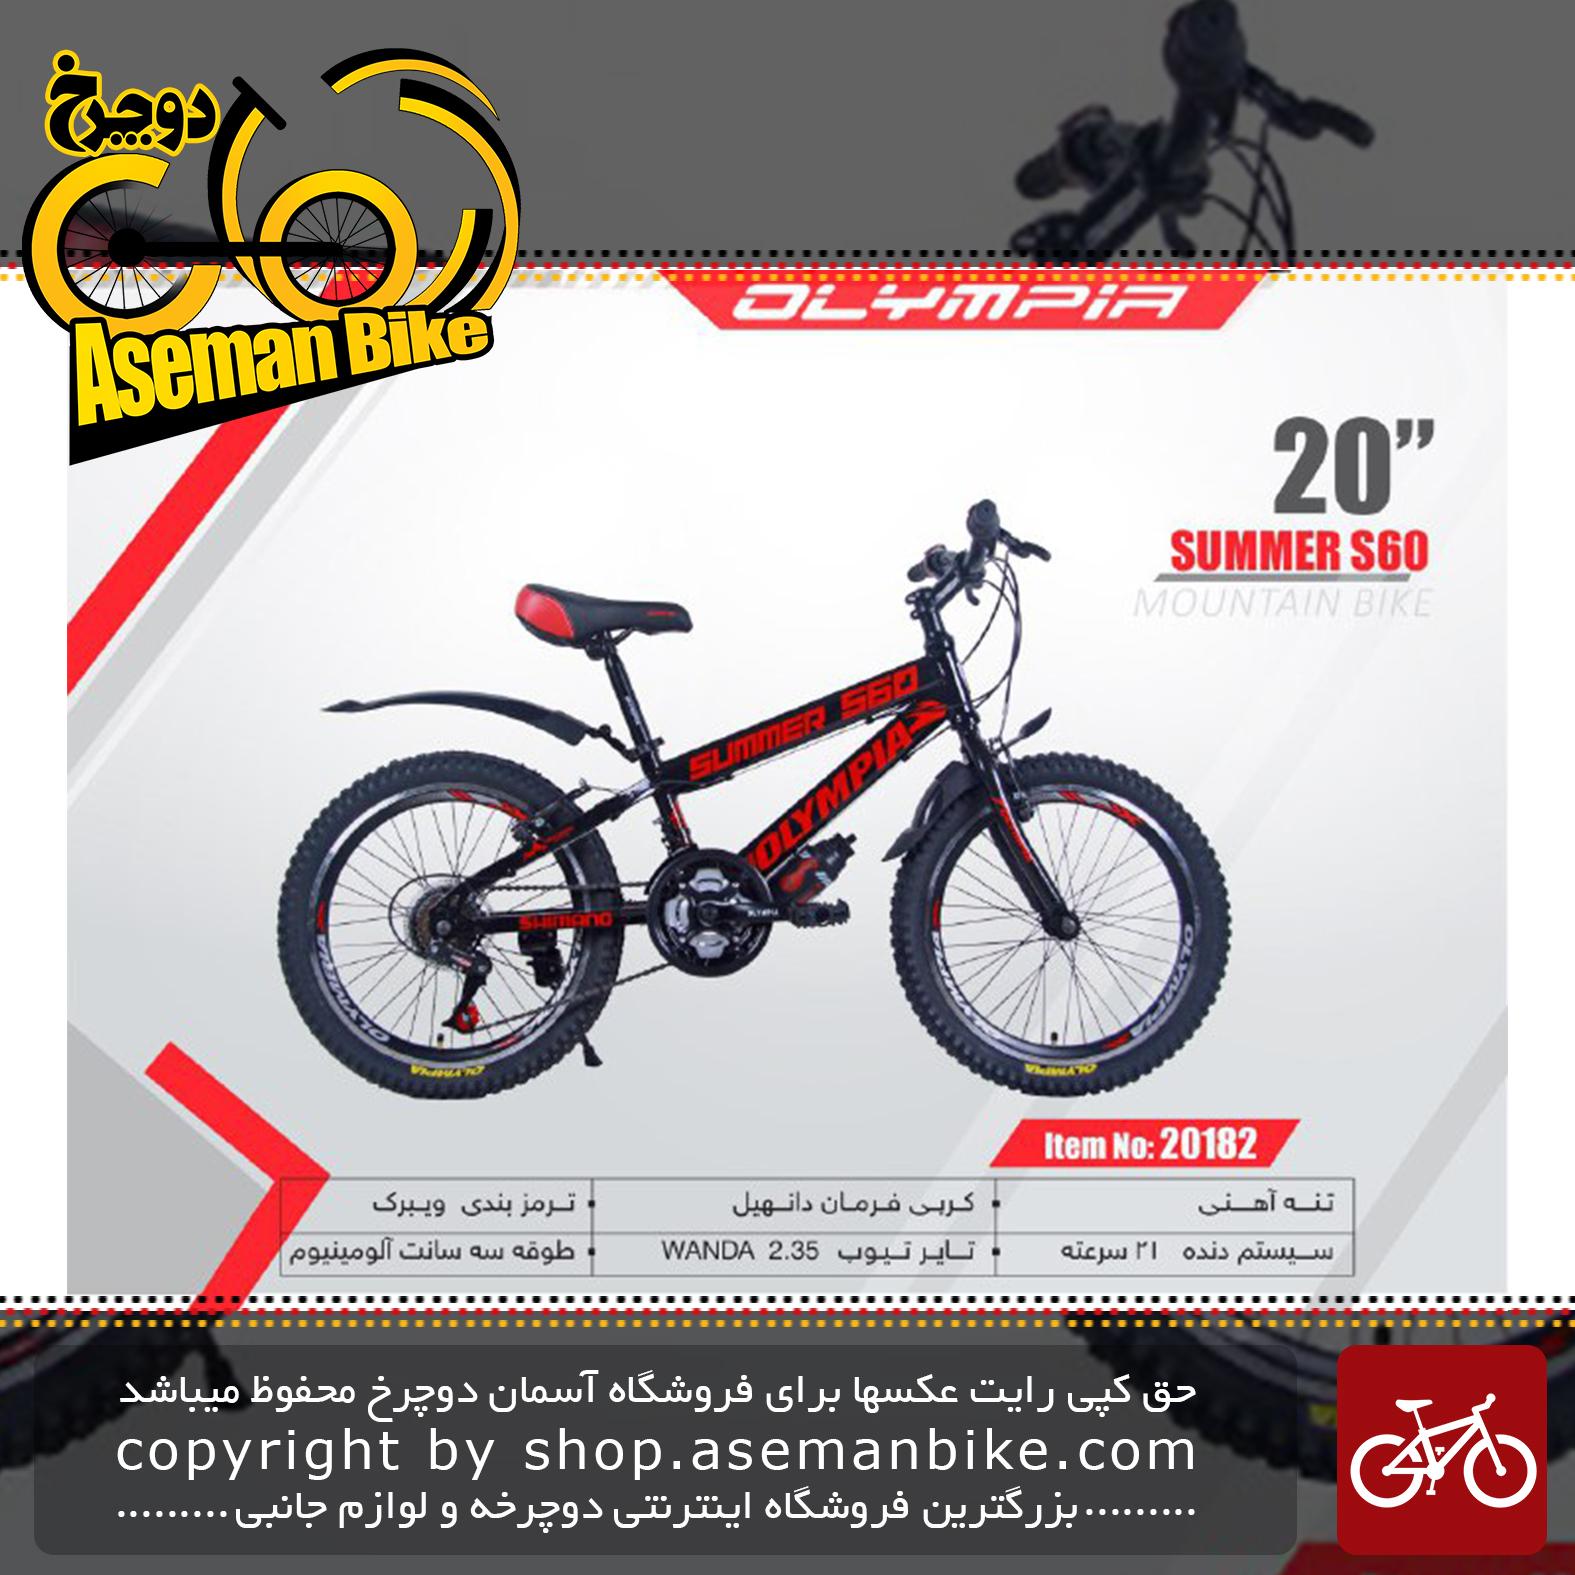 دوچرخه کوهستان المپیا سایز 20مدل سامر اس 60 OLYMPIA SIZE 20 SUMMER S60